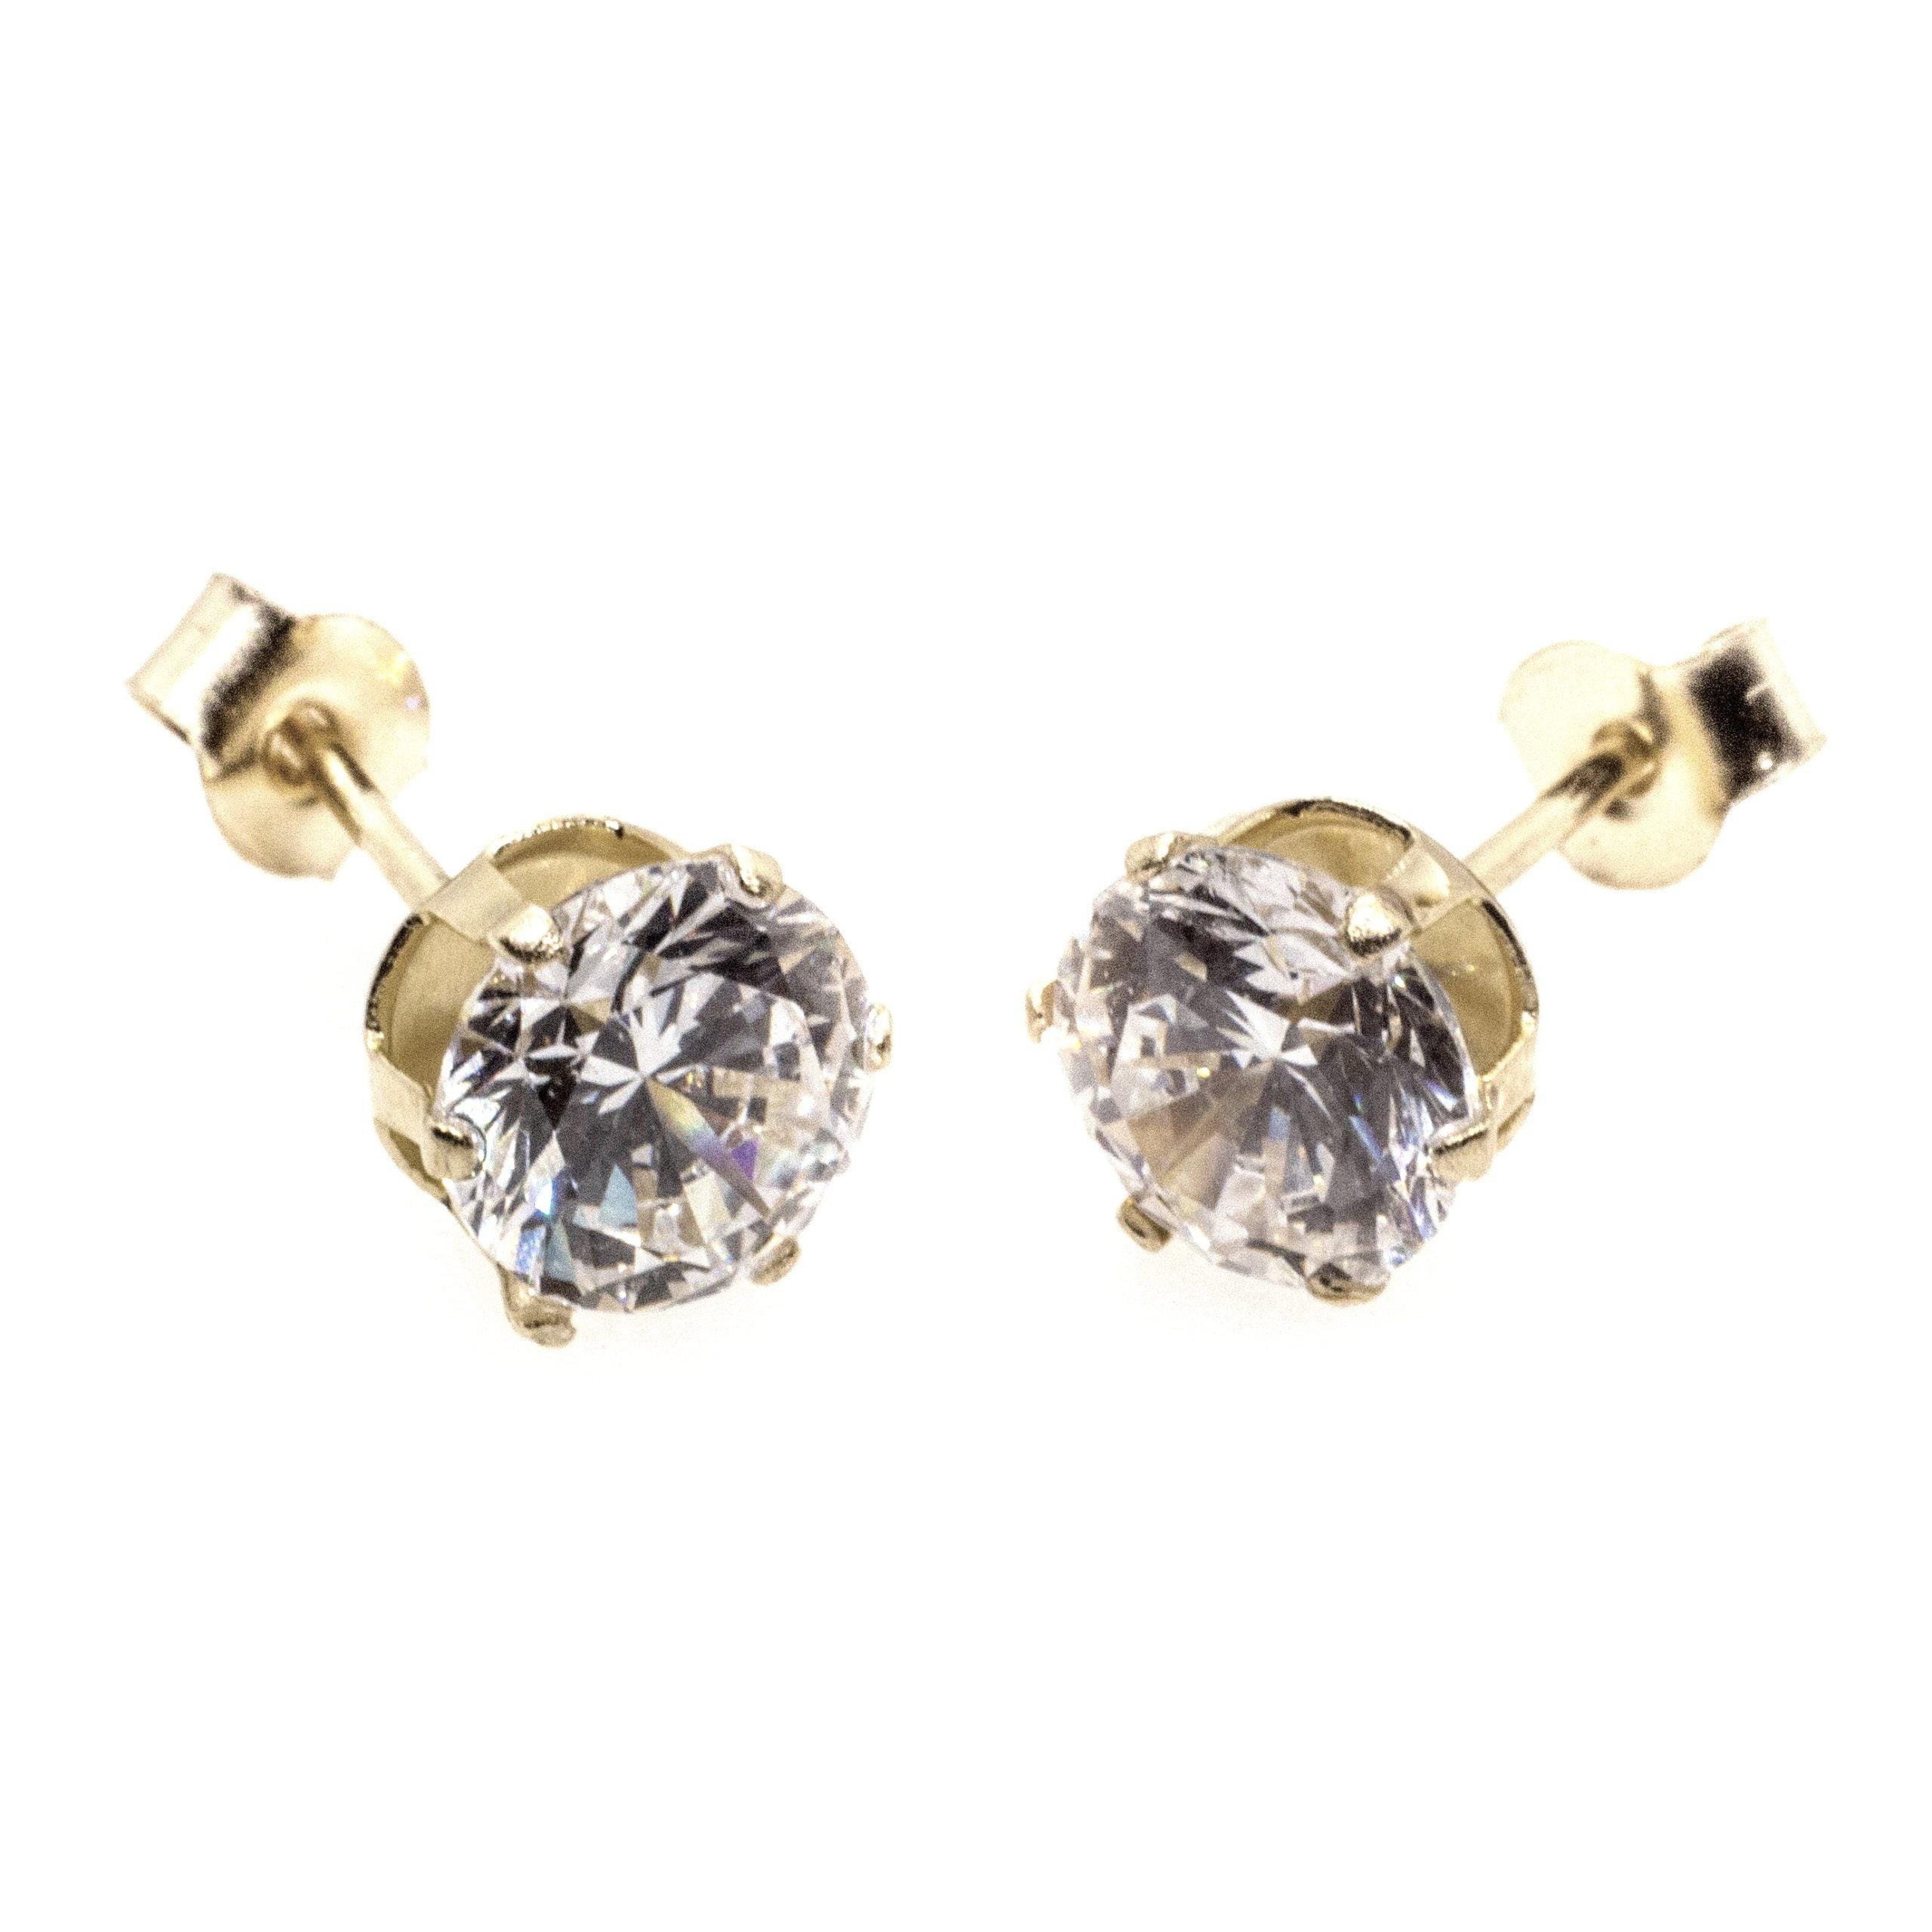 5mm CZ stud earrings 9ct yellow gold alt 4